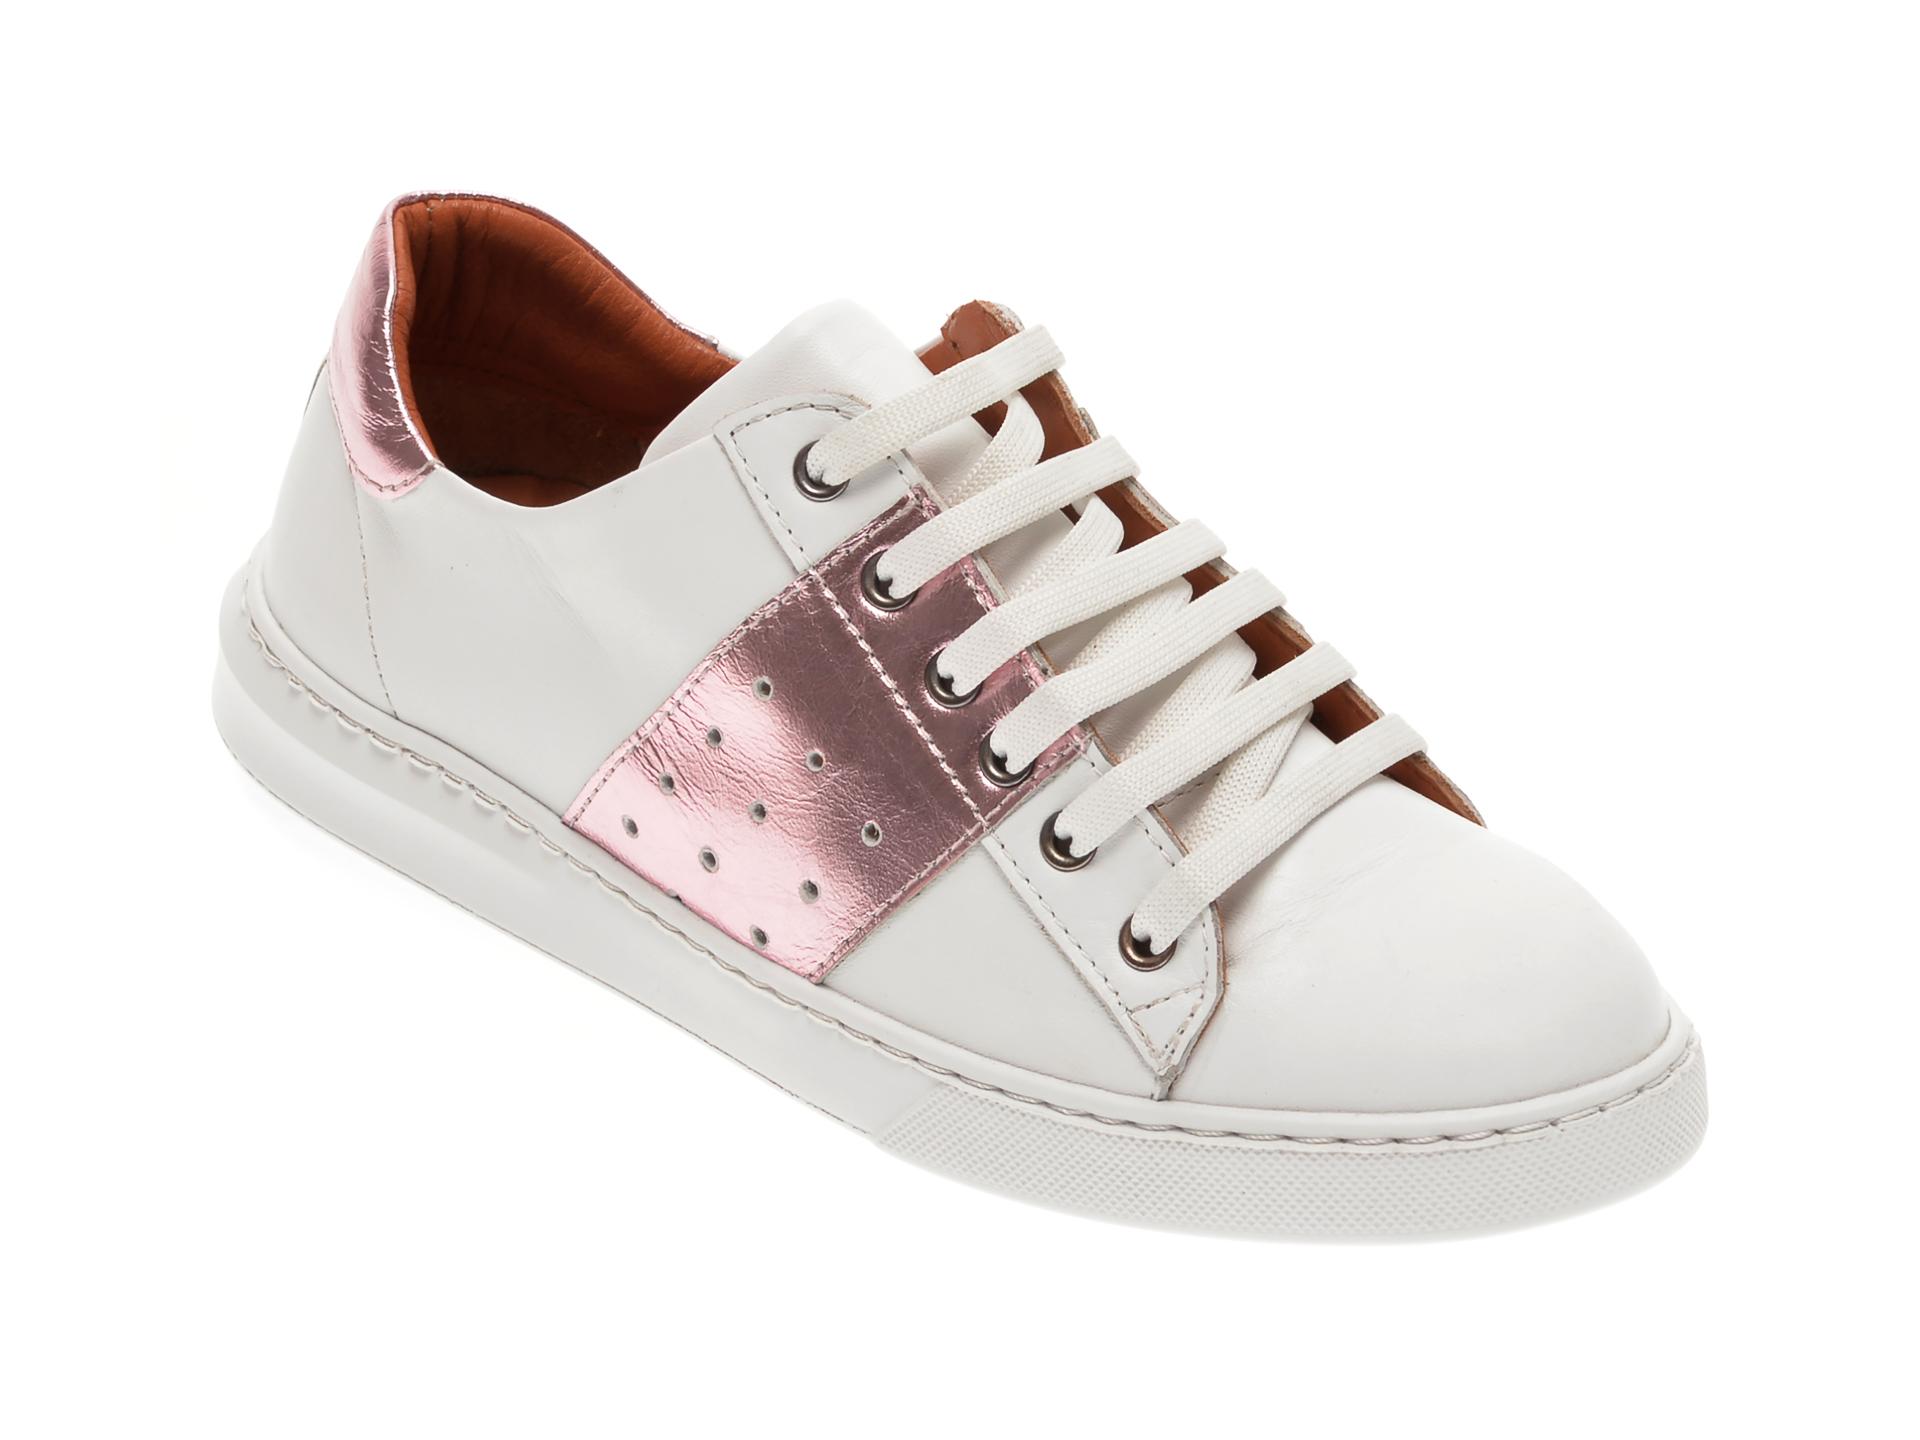 Pantofi BABOOS albi, 2303, din piele naturala imagine